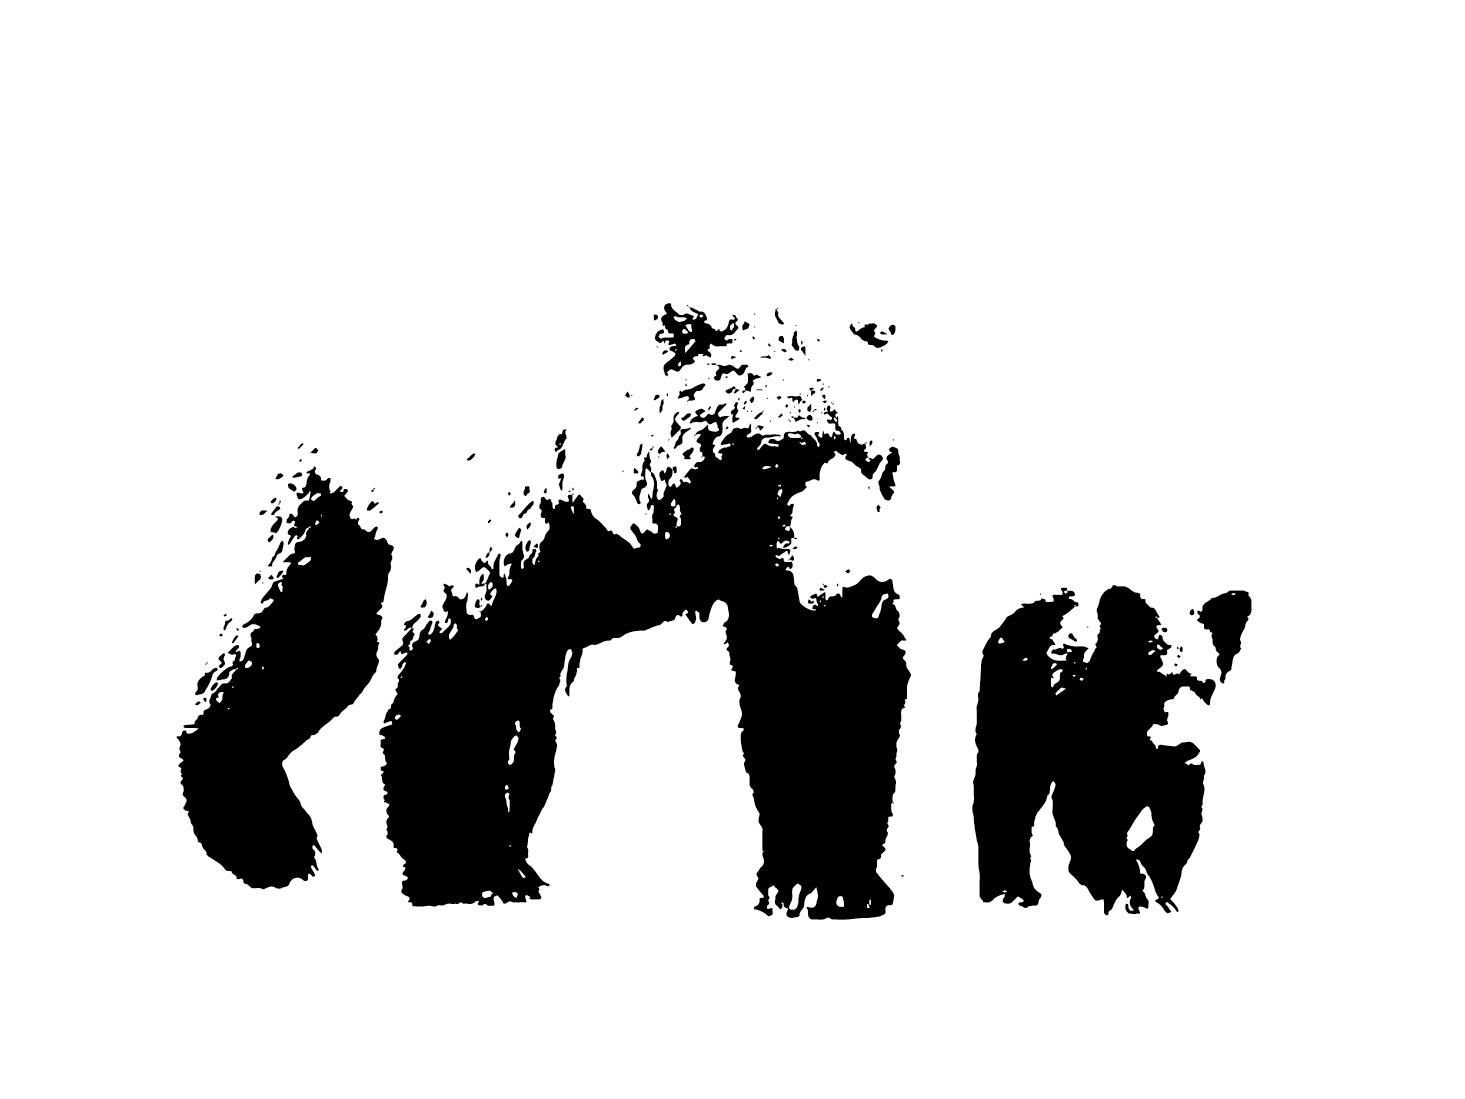 White Space Bear